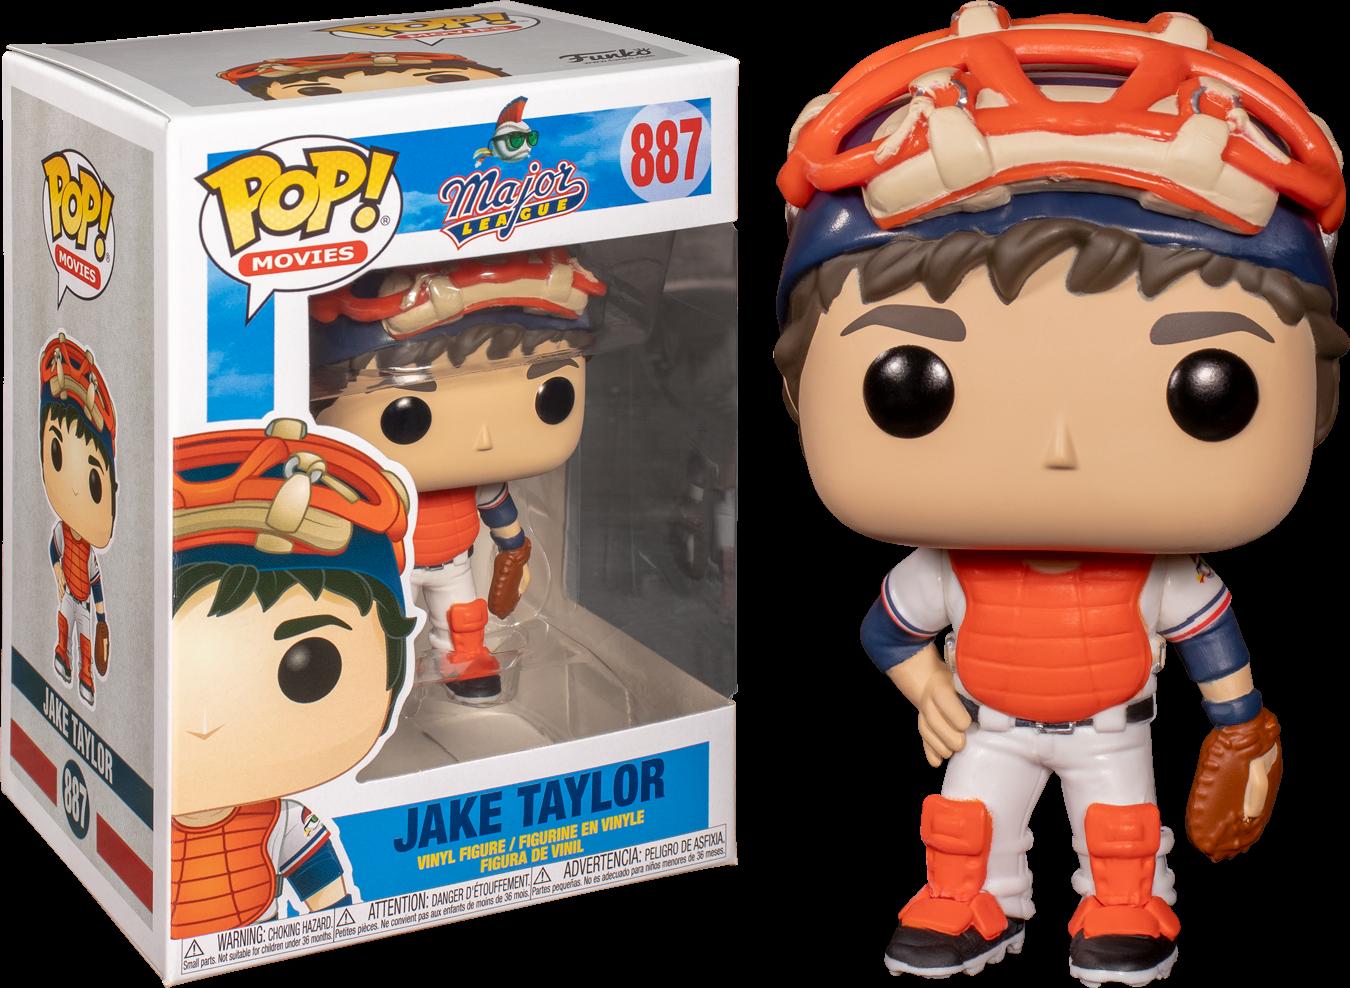 Major League - Jake Taylor Pop! Vinyl